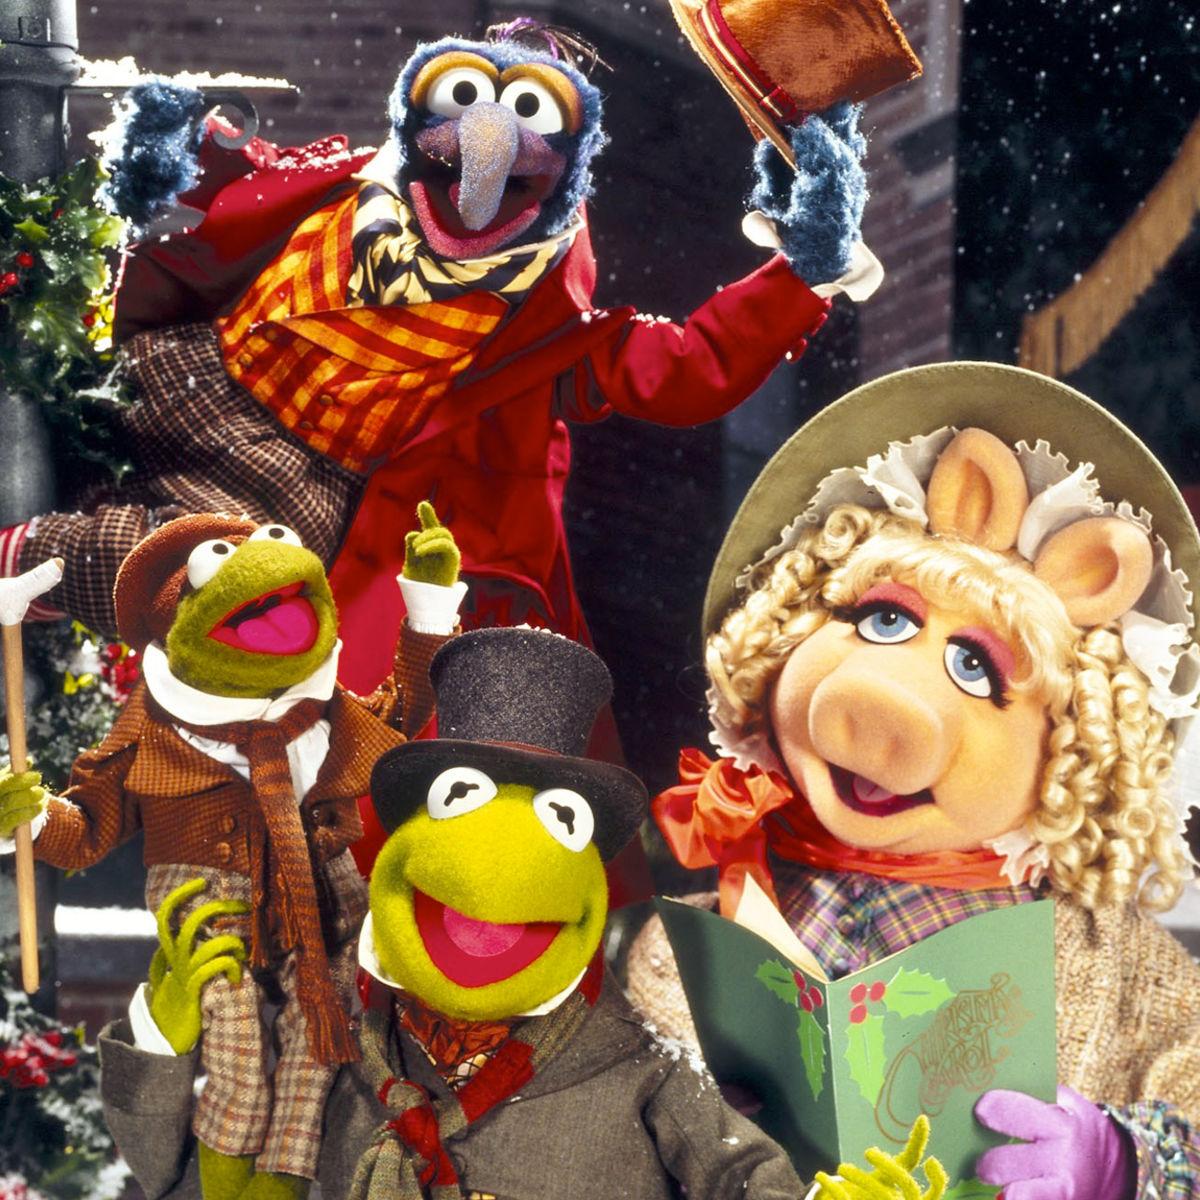 Deja View: The Muppet Christmas Carol | SYFY WIRE